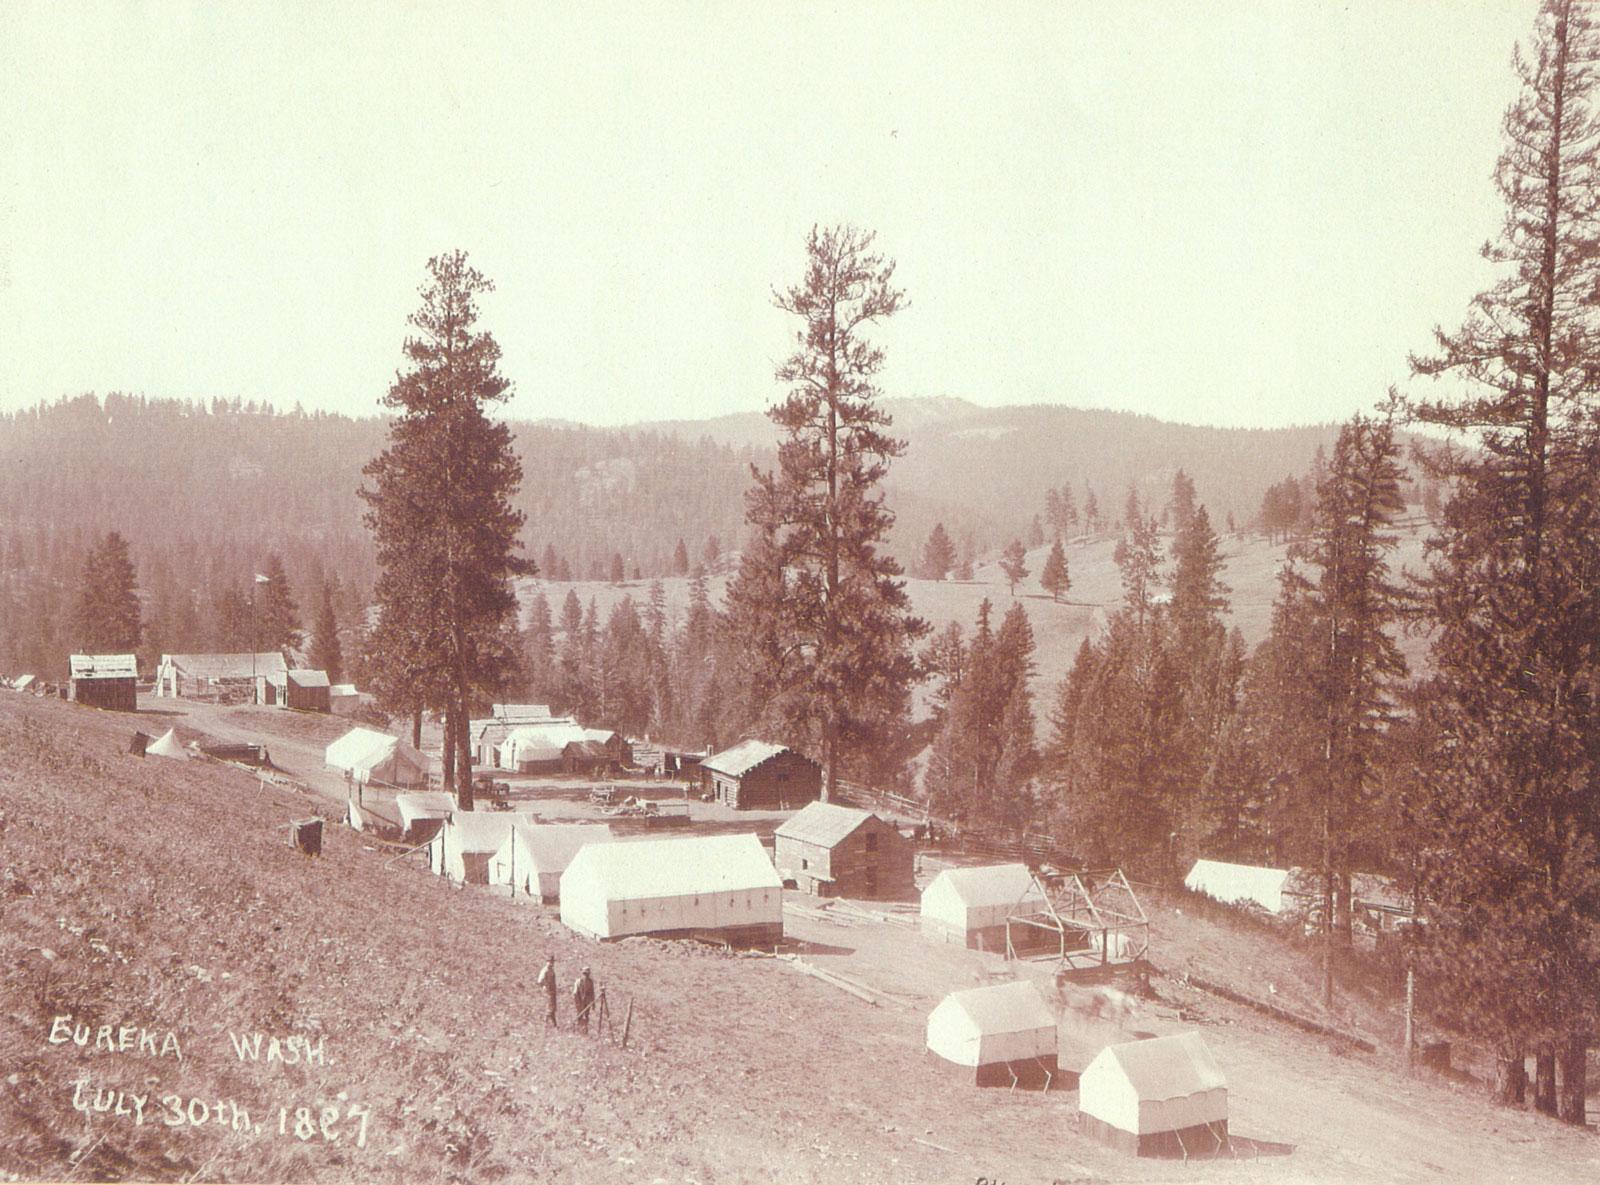 Eureka, Washington July 30th 1897